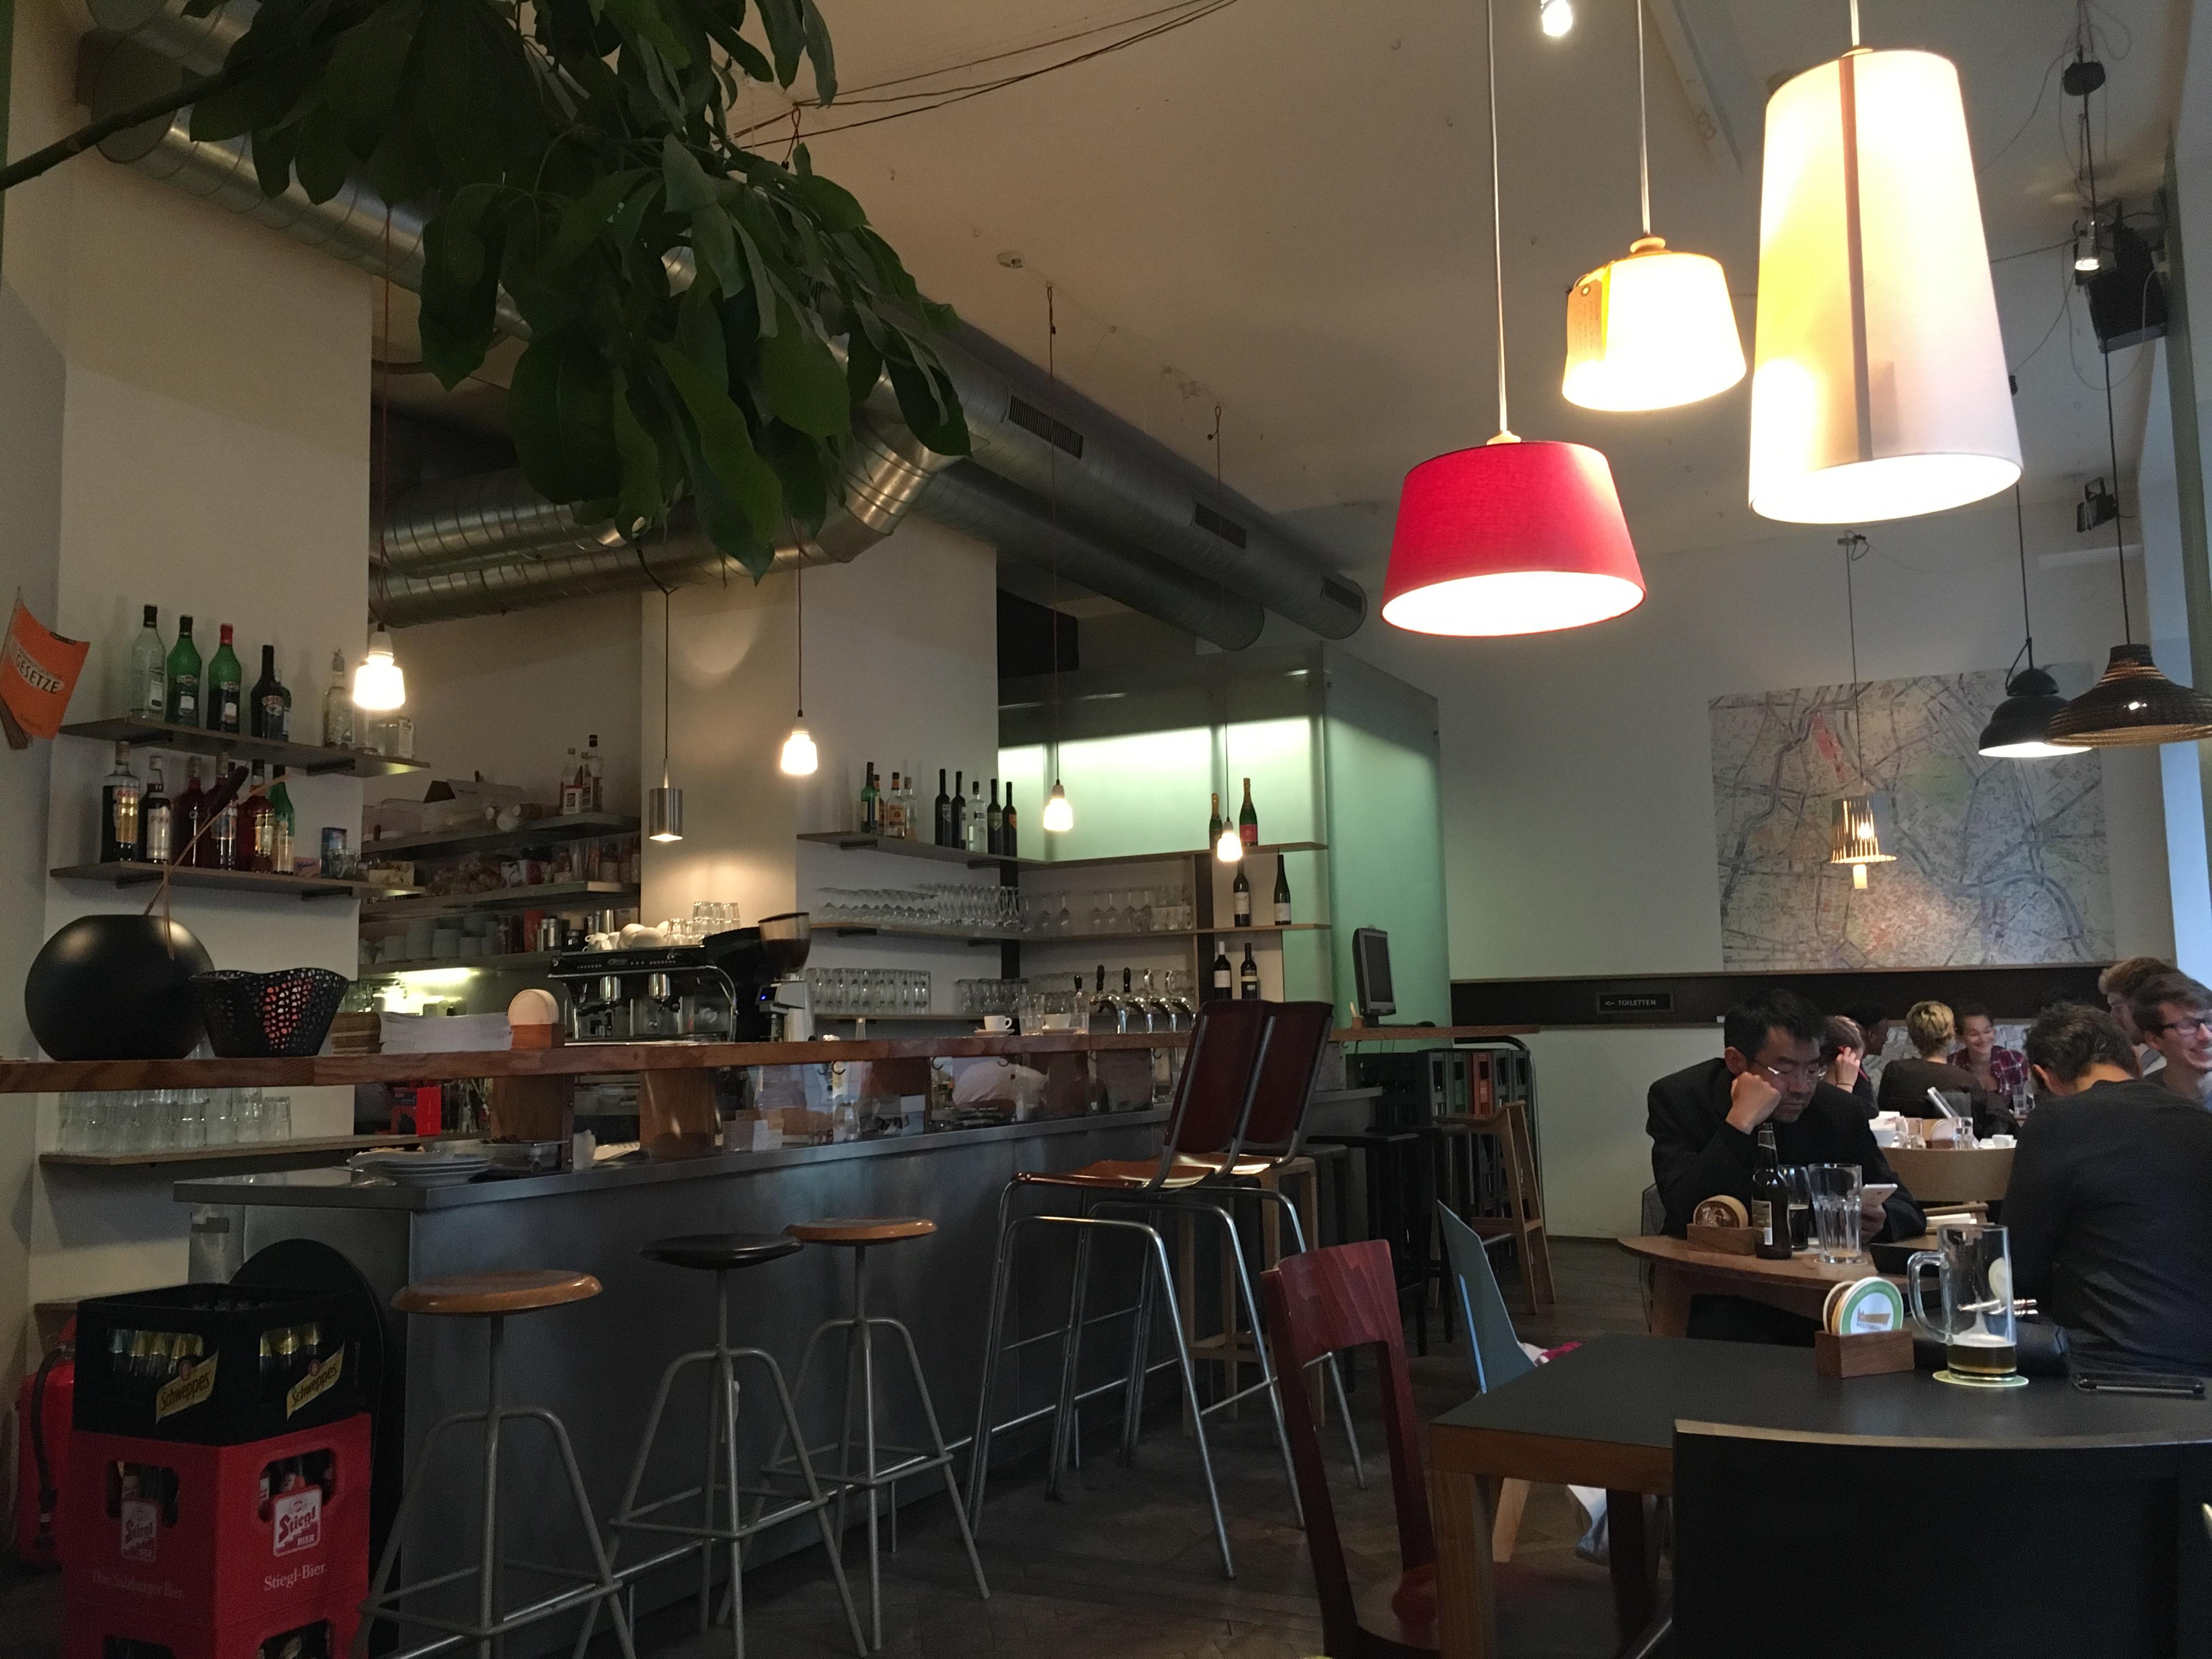 das möbel cafe in Wien